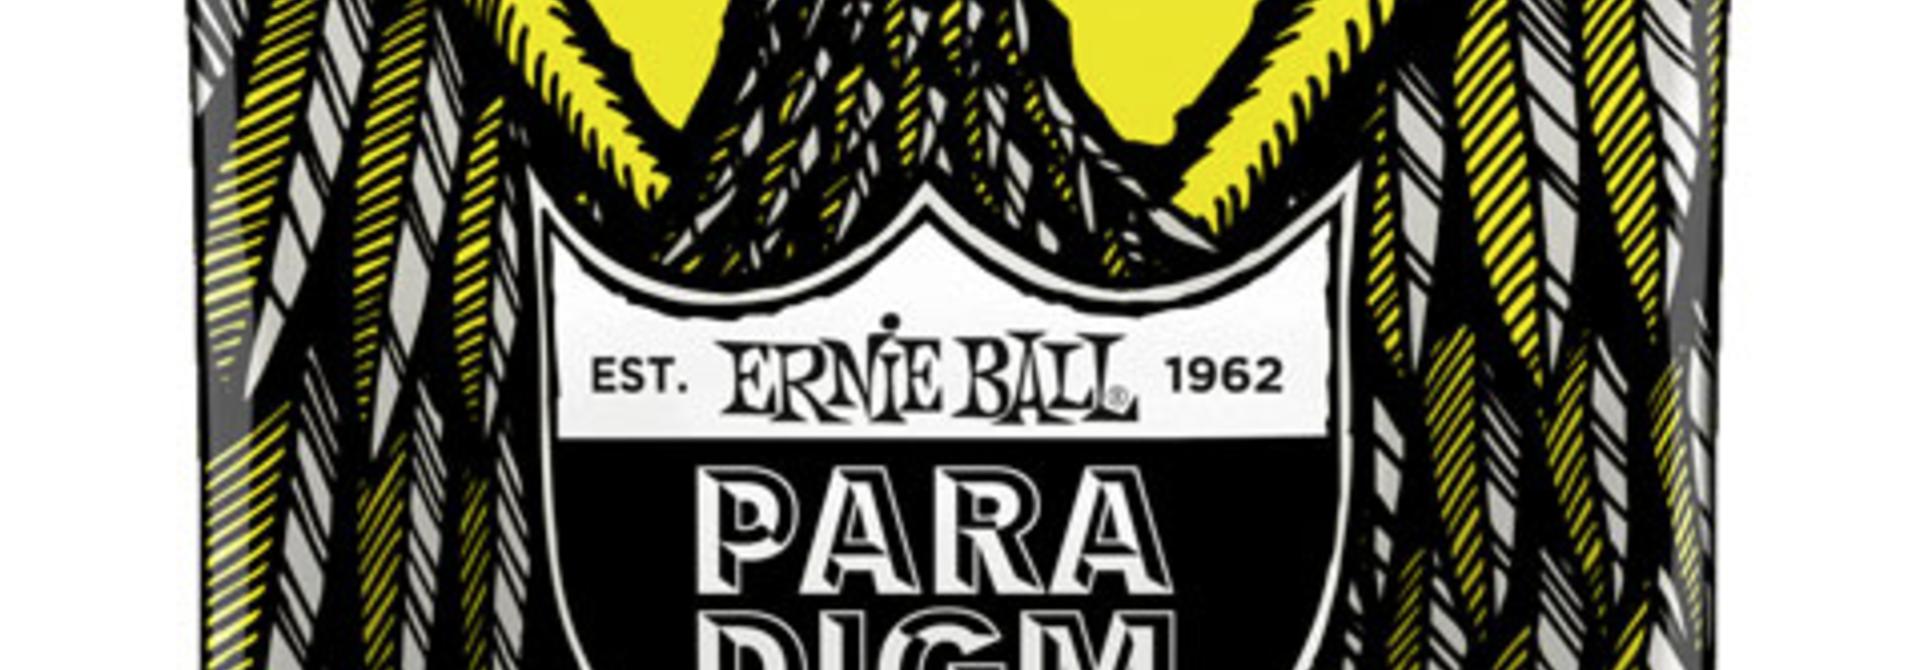 Ernie Ball Paradigm Beefy Slinky Guitar Strings (11-54) 2027